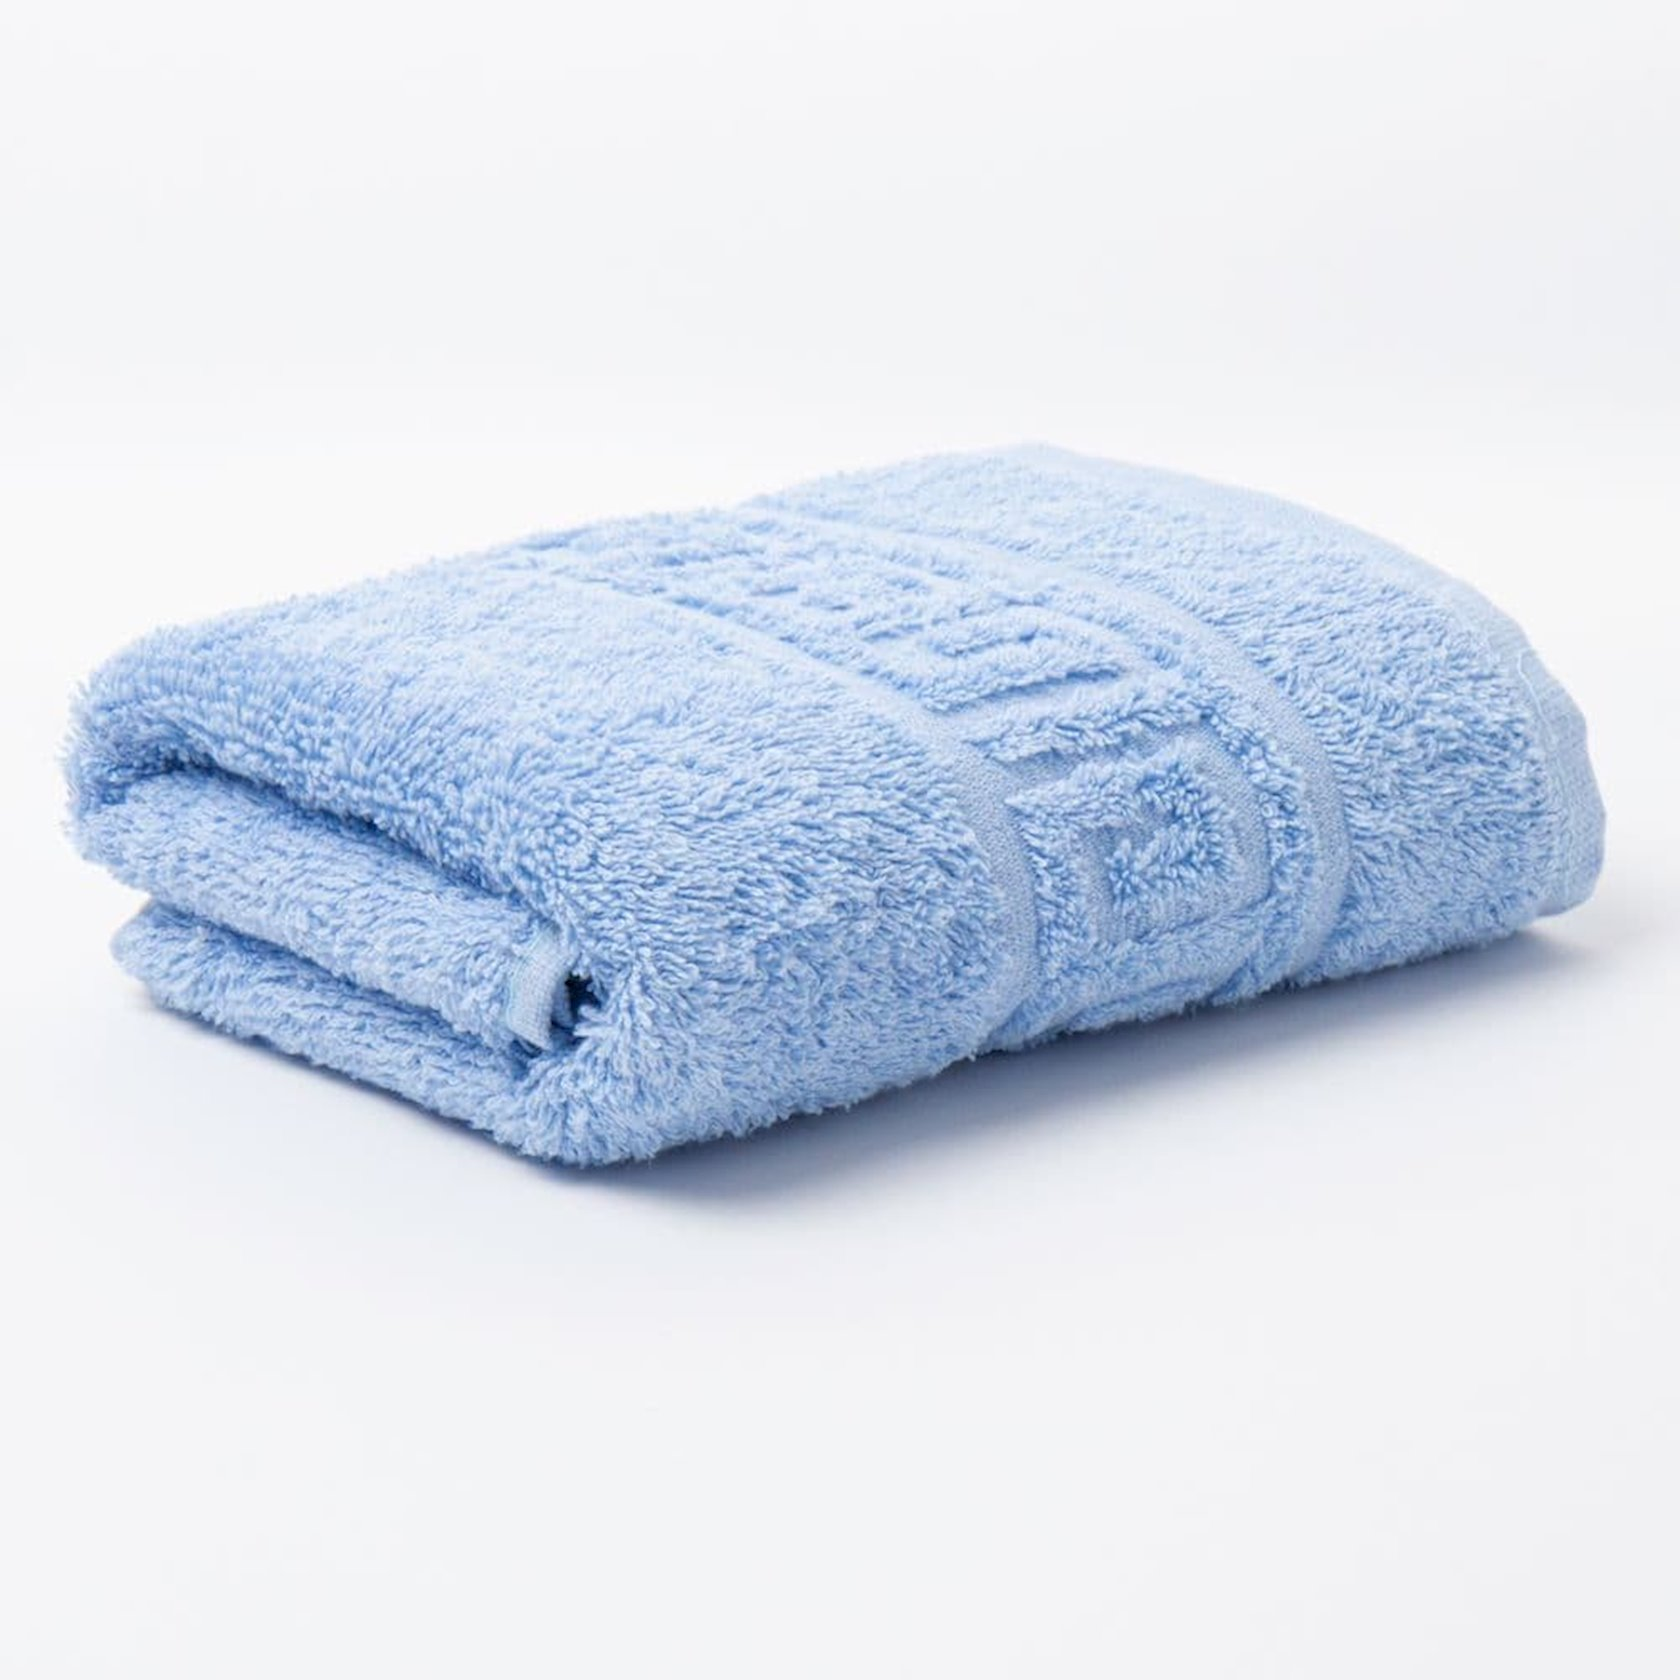 Dəsmal ADT Cashemere blue 40x70, sıxlıq 430 qr/m²